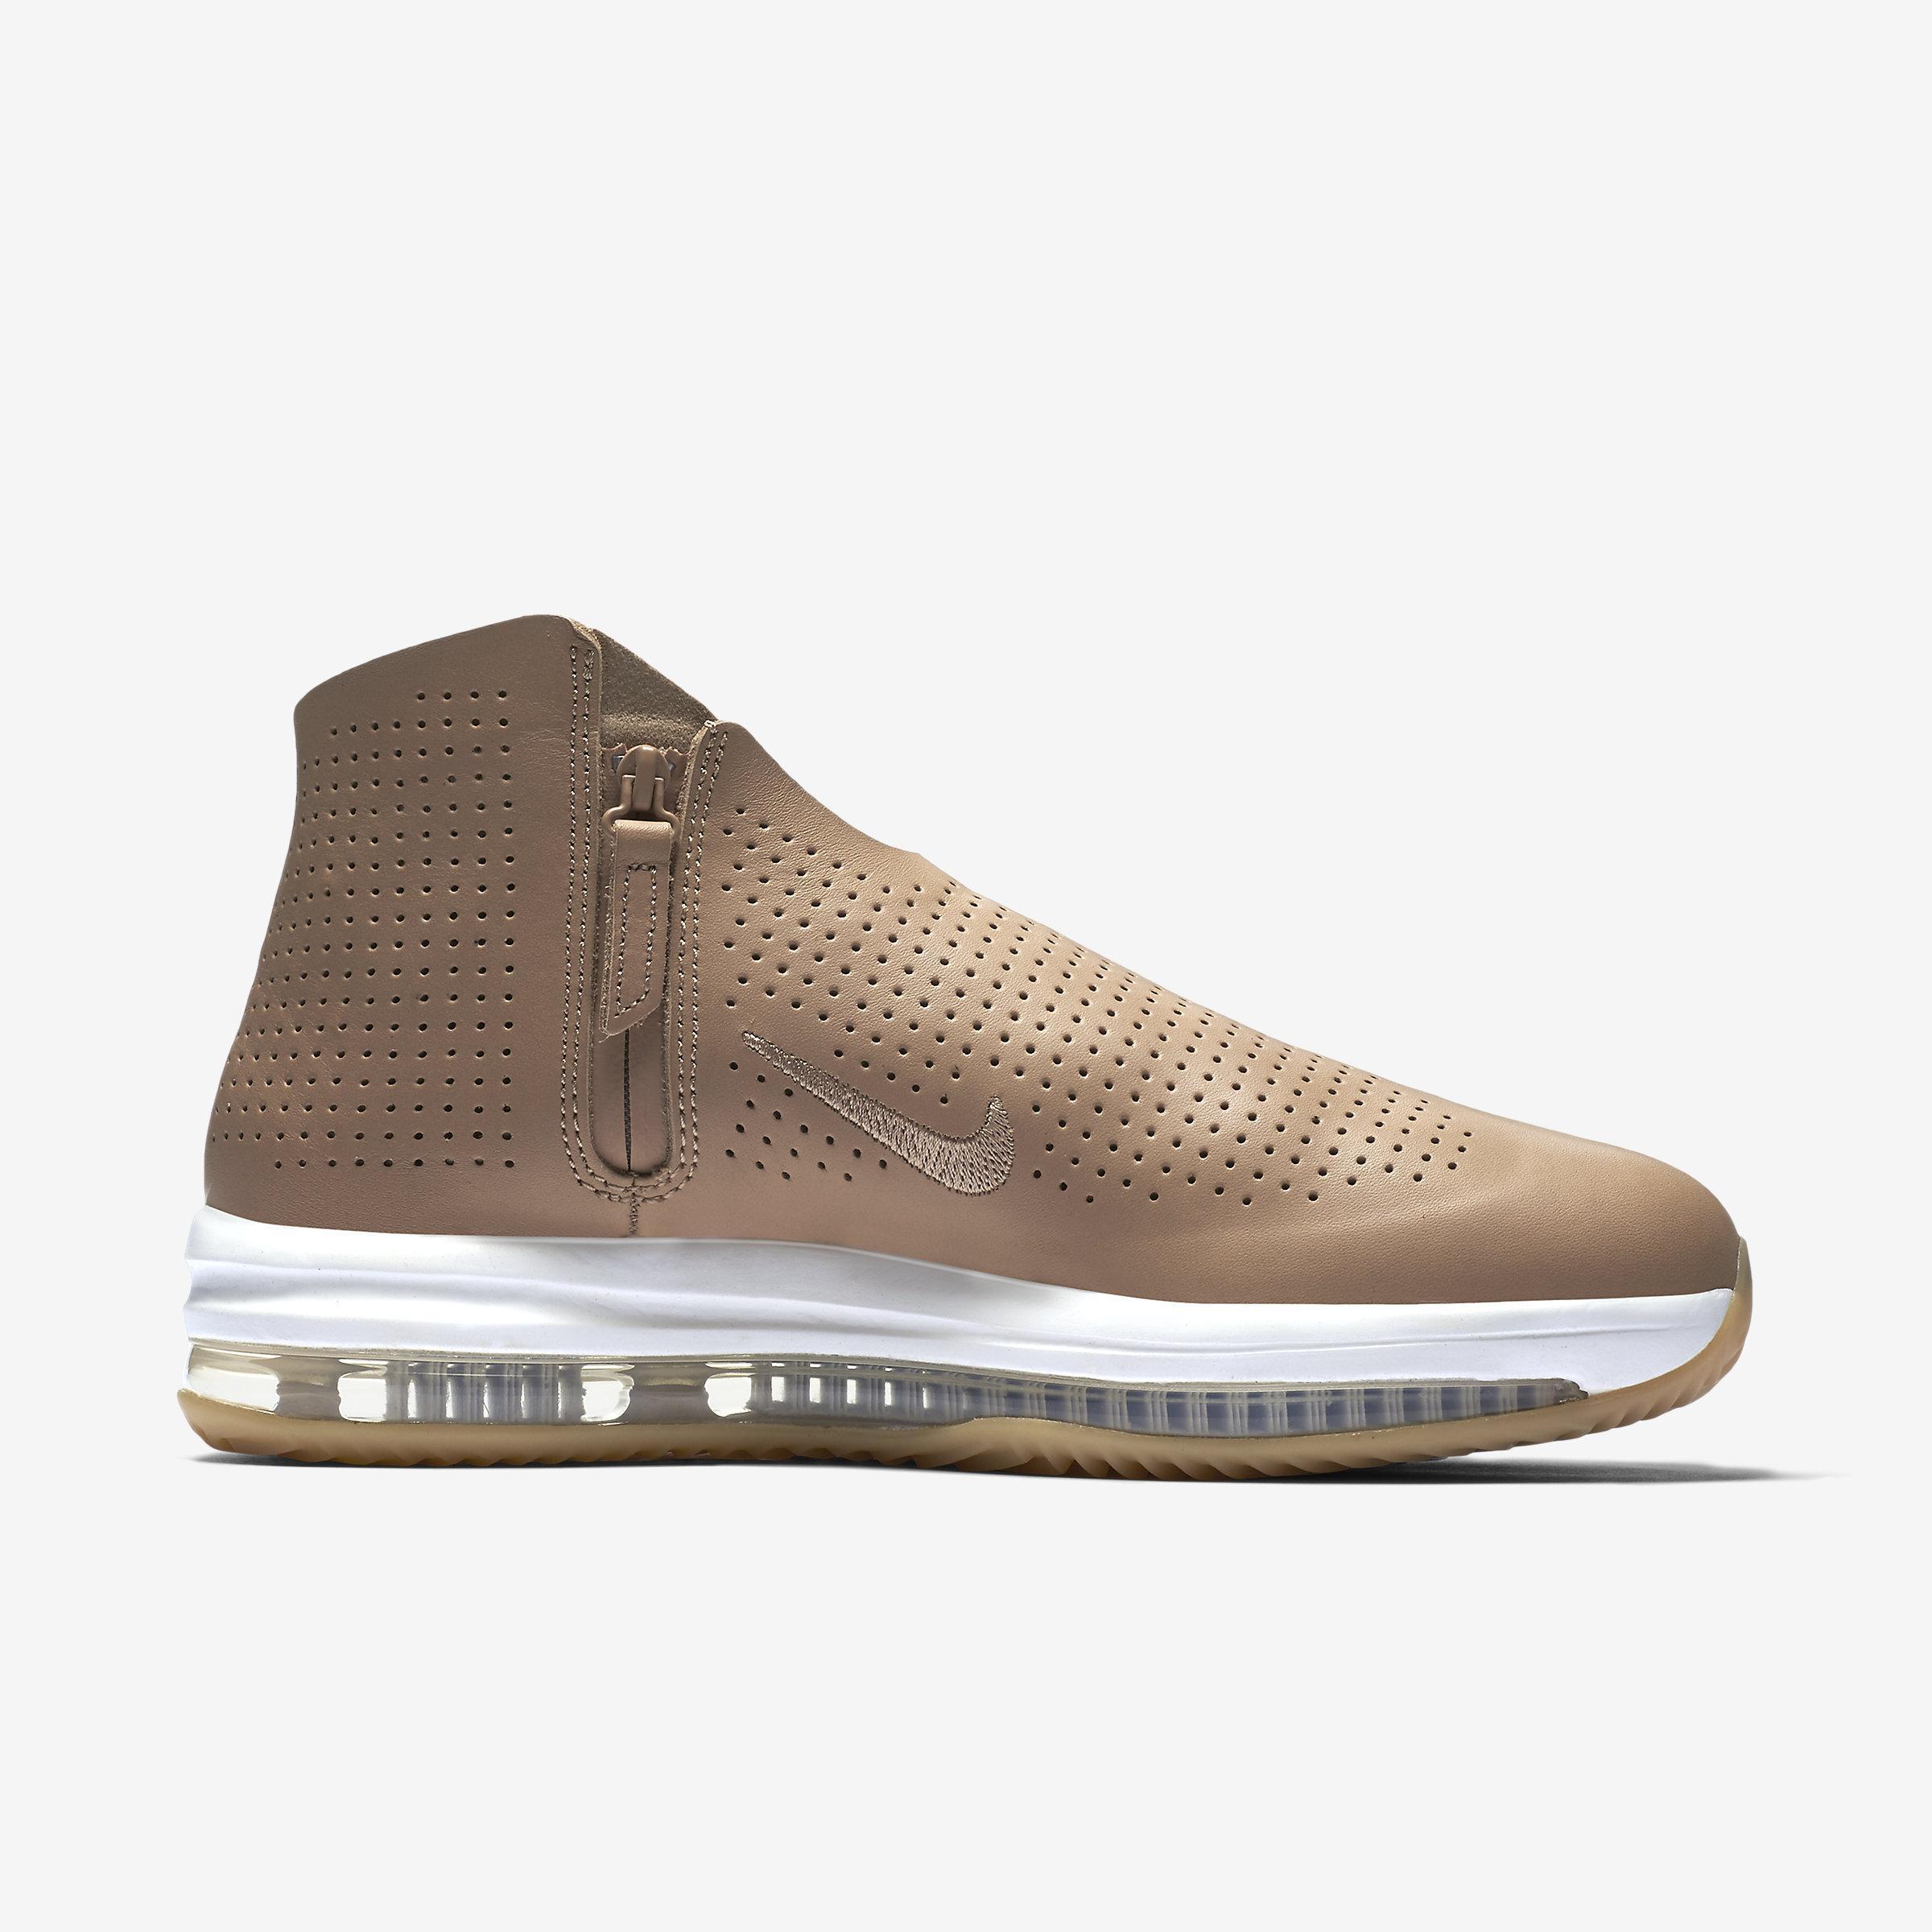 97343a837b1f Nike Zoom Modairna in Brown for Men - Lyst